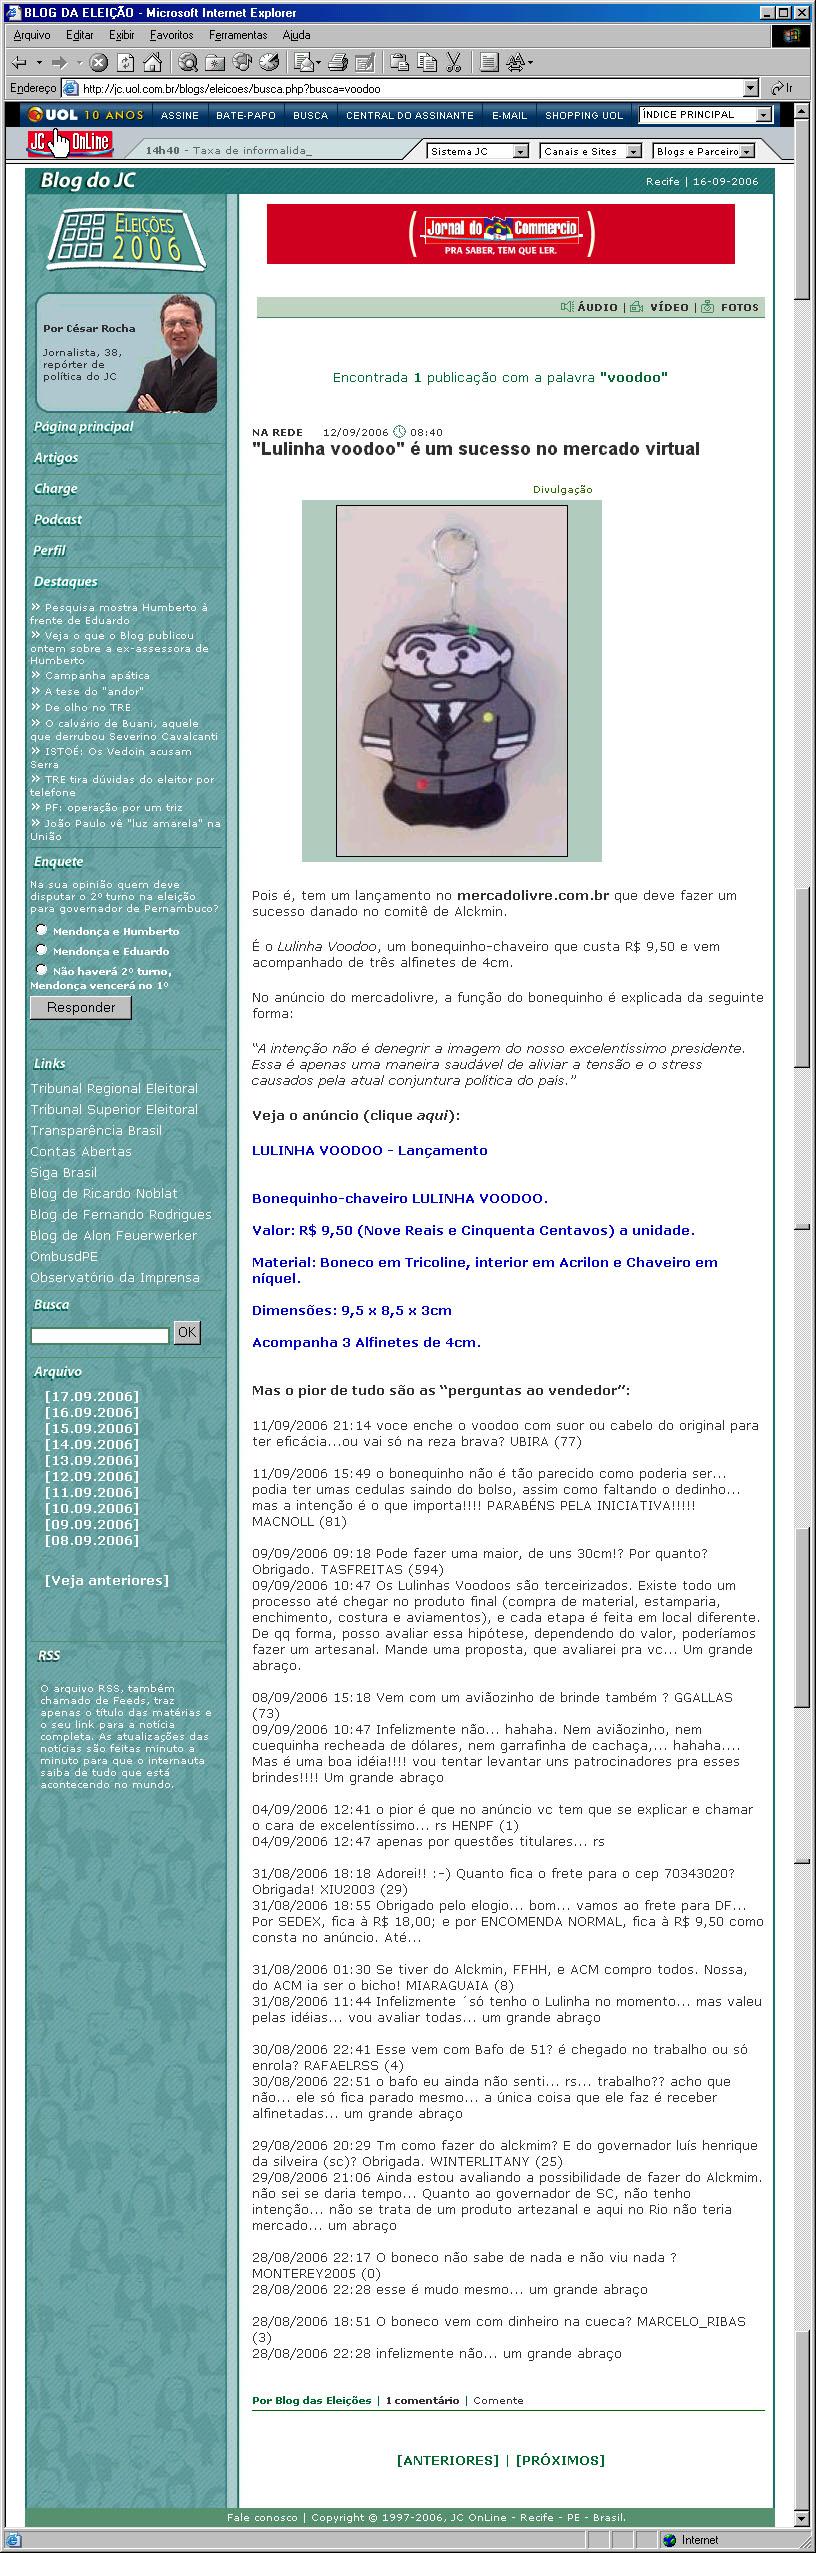 jornaldocommercioonline - BX